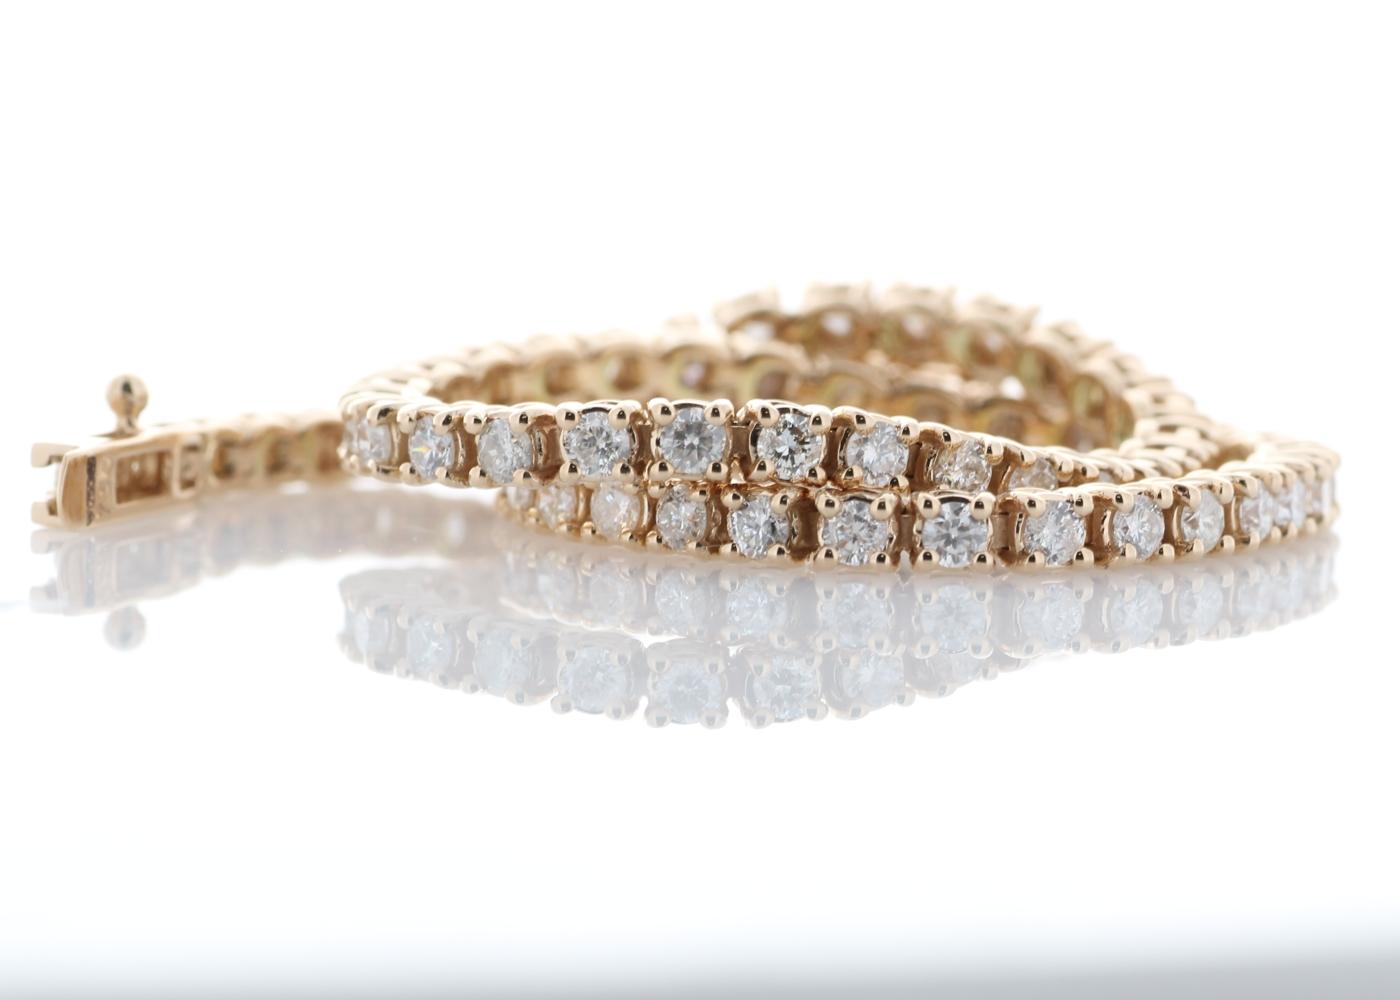 Lot 6 - 18ct Rose Gold Tennis Diamond Bracelet 2.00 Carats